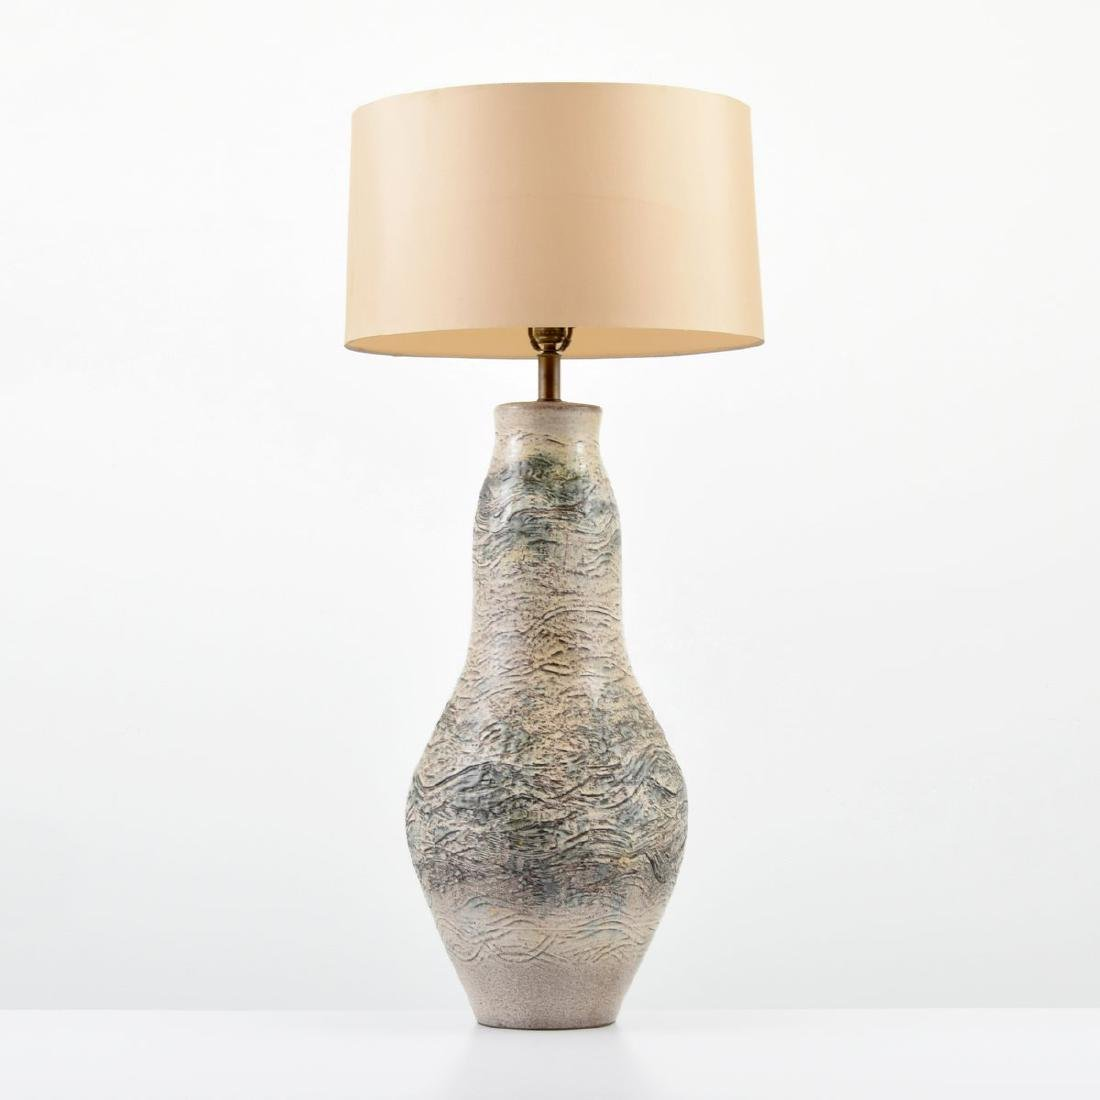 Massive Modern Table Lamp - 10